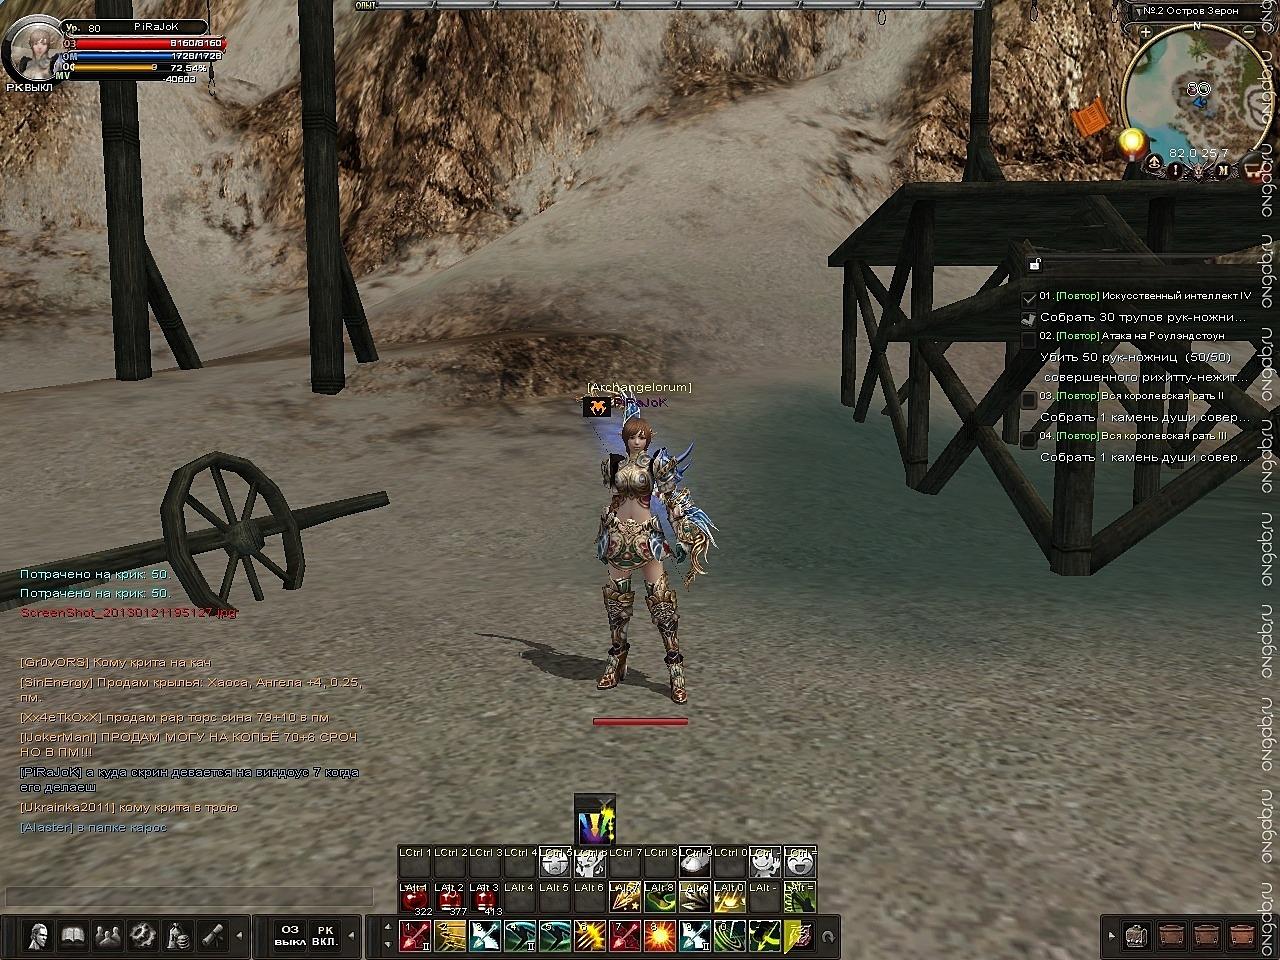 Скриншот Карос: Начало #78849